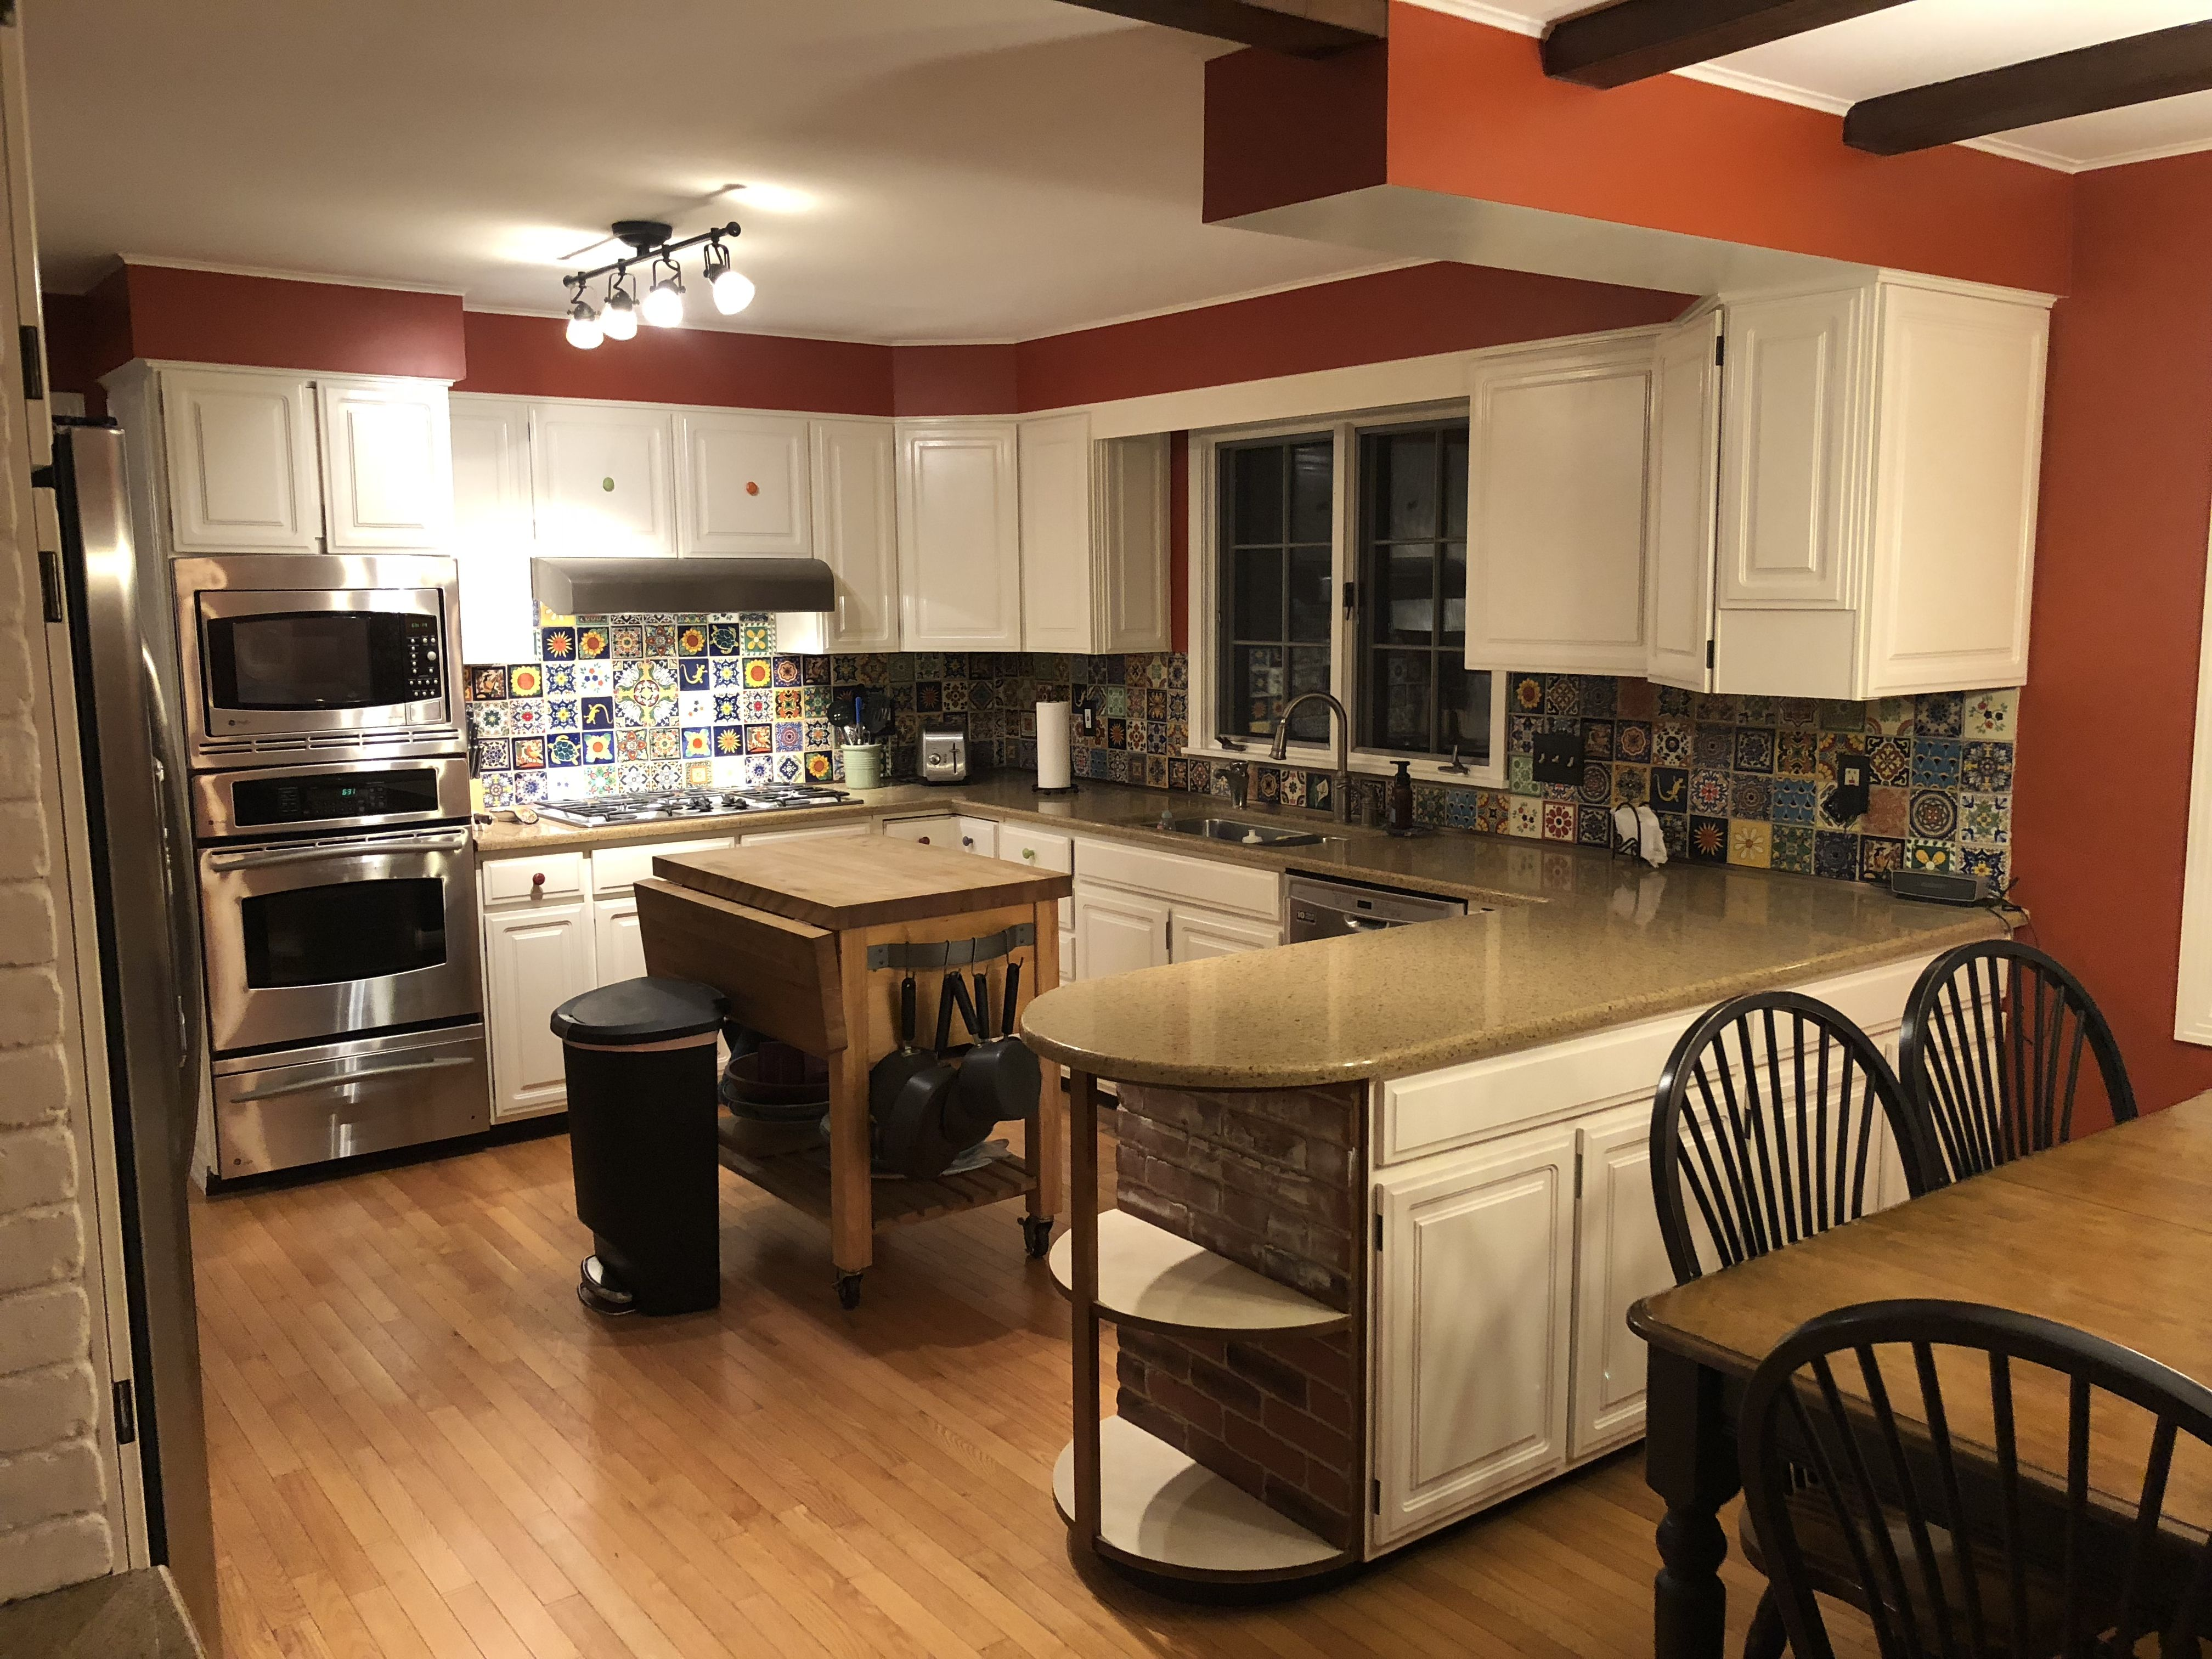 Mexican Tile Backsplash Do it yourself! Paint your kitchen ...